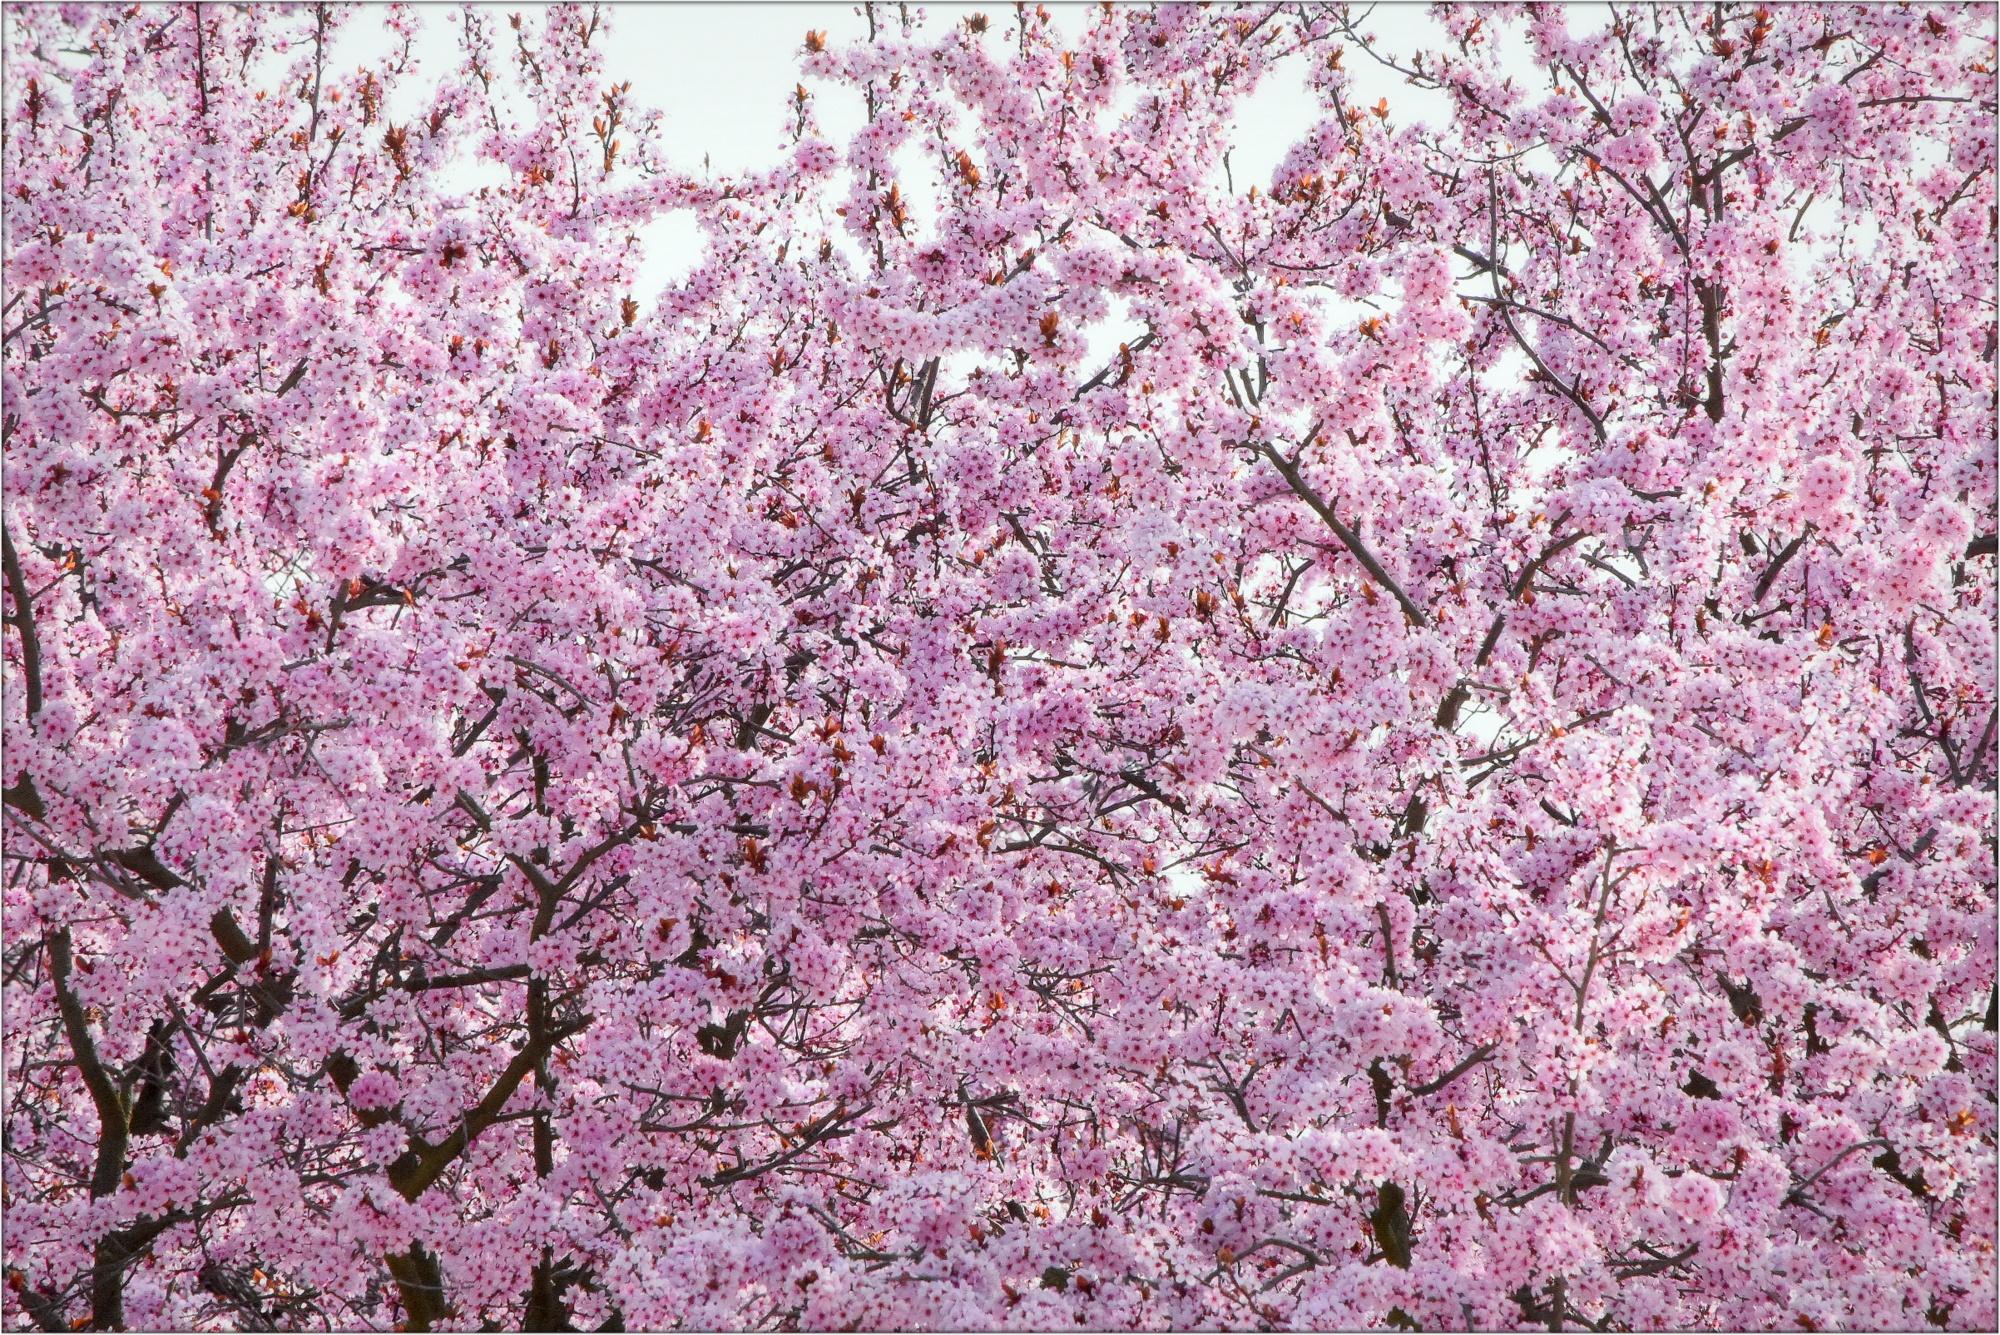 """springtime explosion"" by BauerStefan"